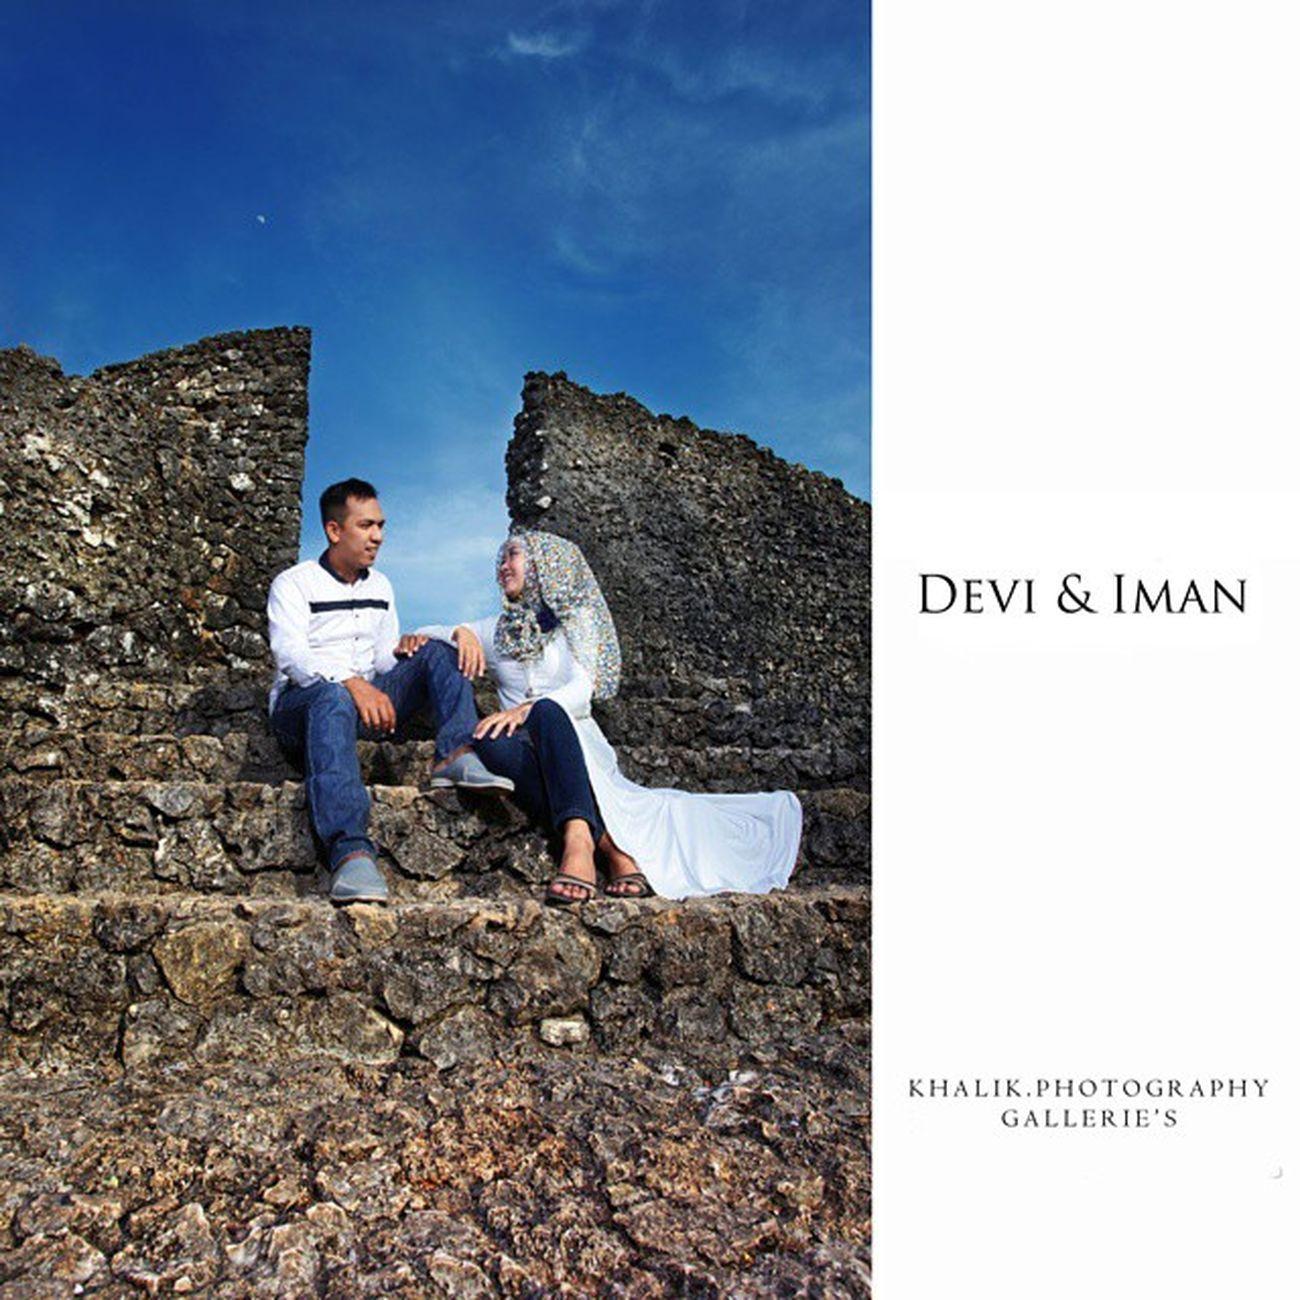 Prewedding of Devi & Iman Latepost Prewedding Prewedding_indonesia Keraton_buton baubau buton sulawesi_tenggara